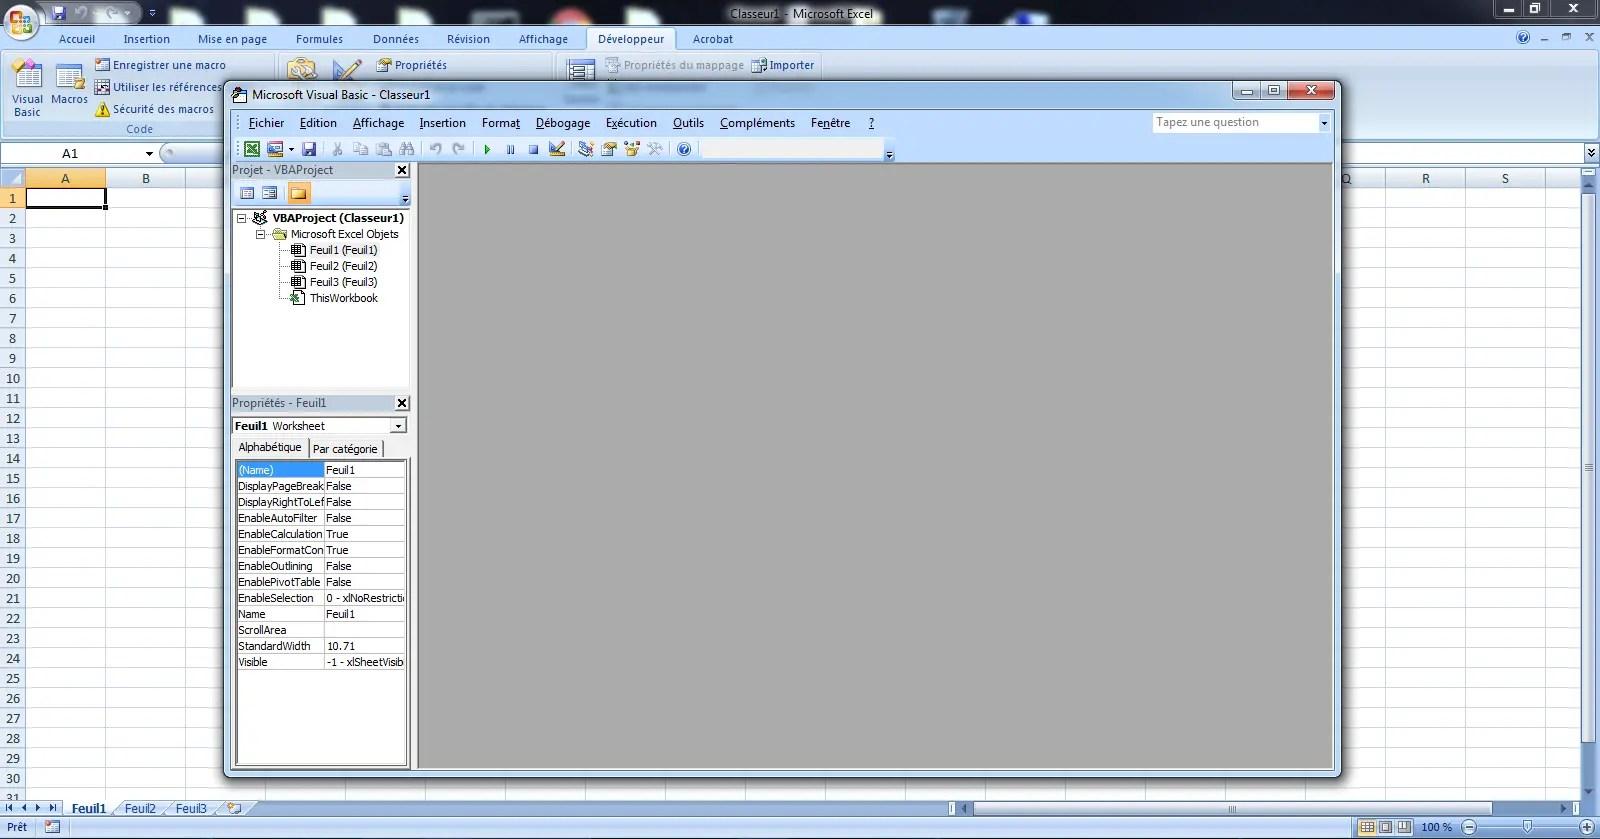 Telecharger Macro Complementaire Excel